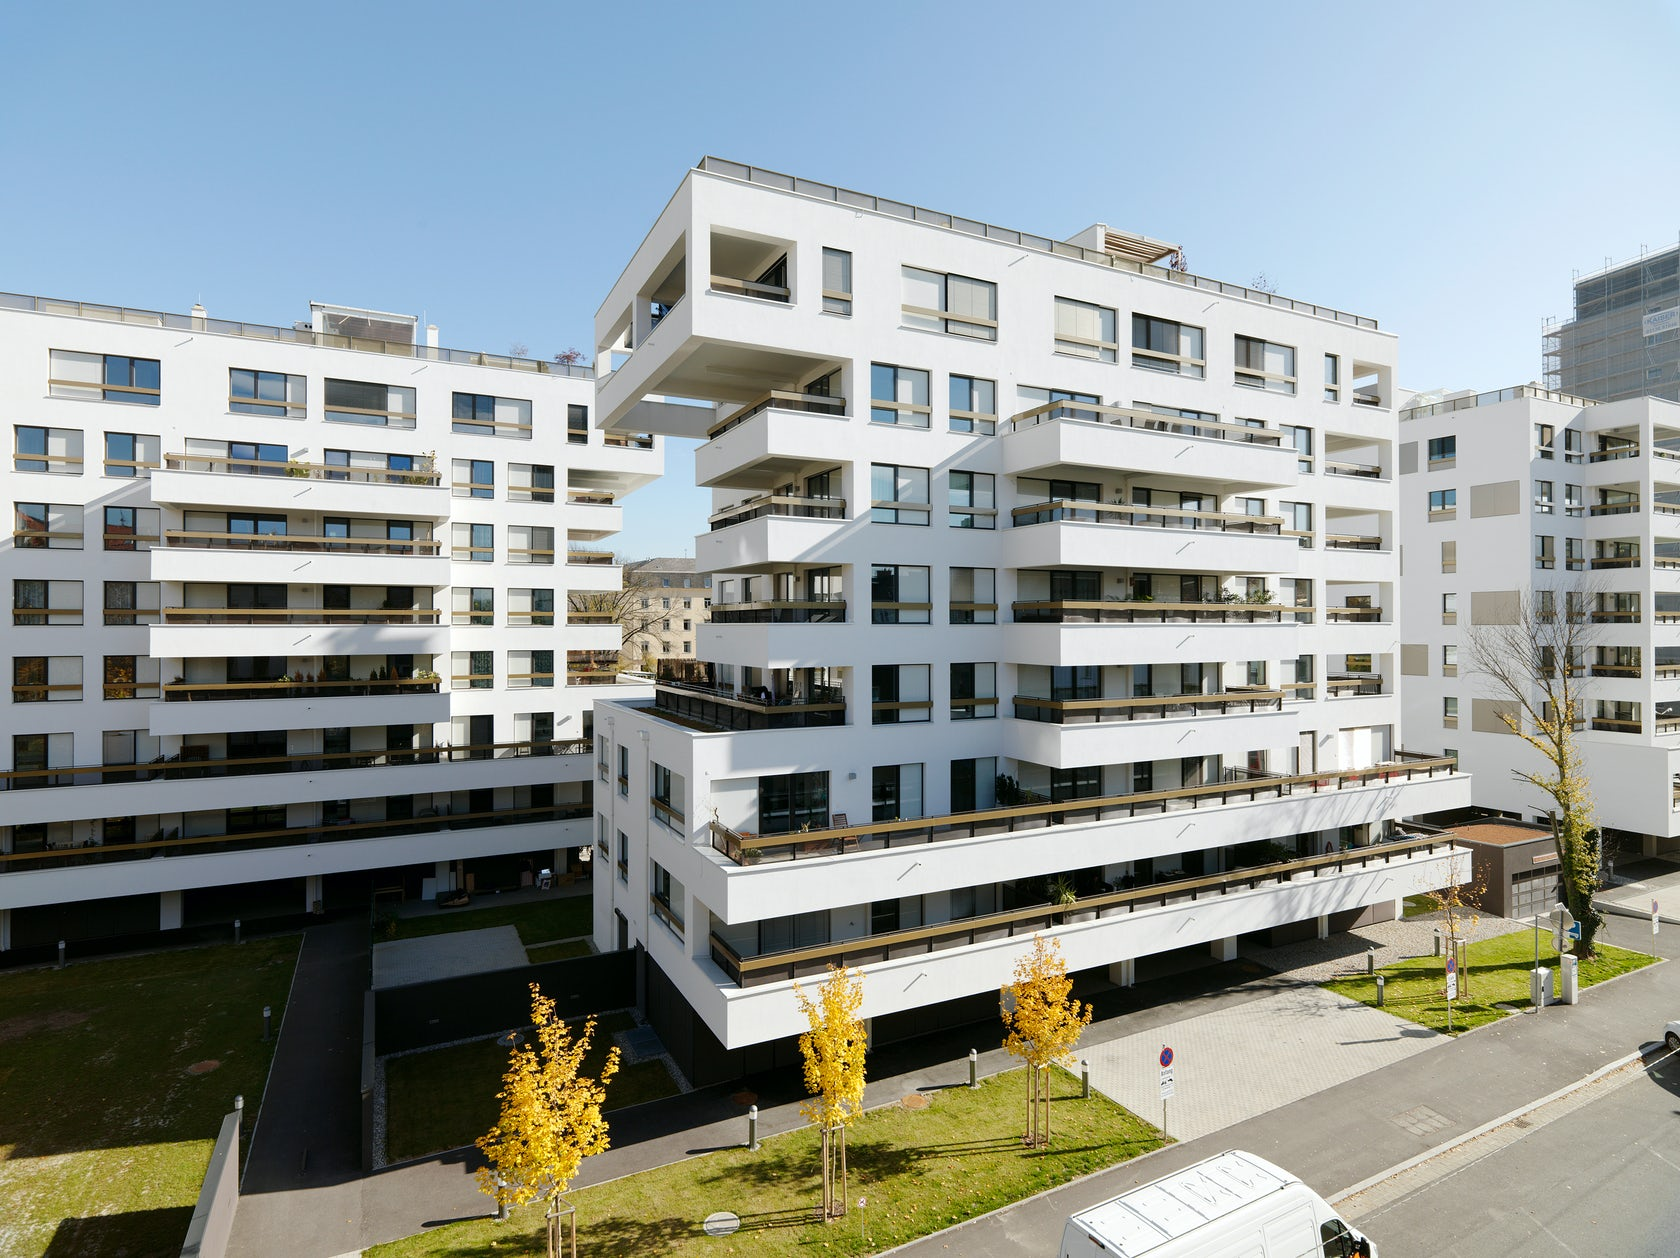 Apartment Houses Laimburggasse